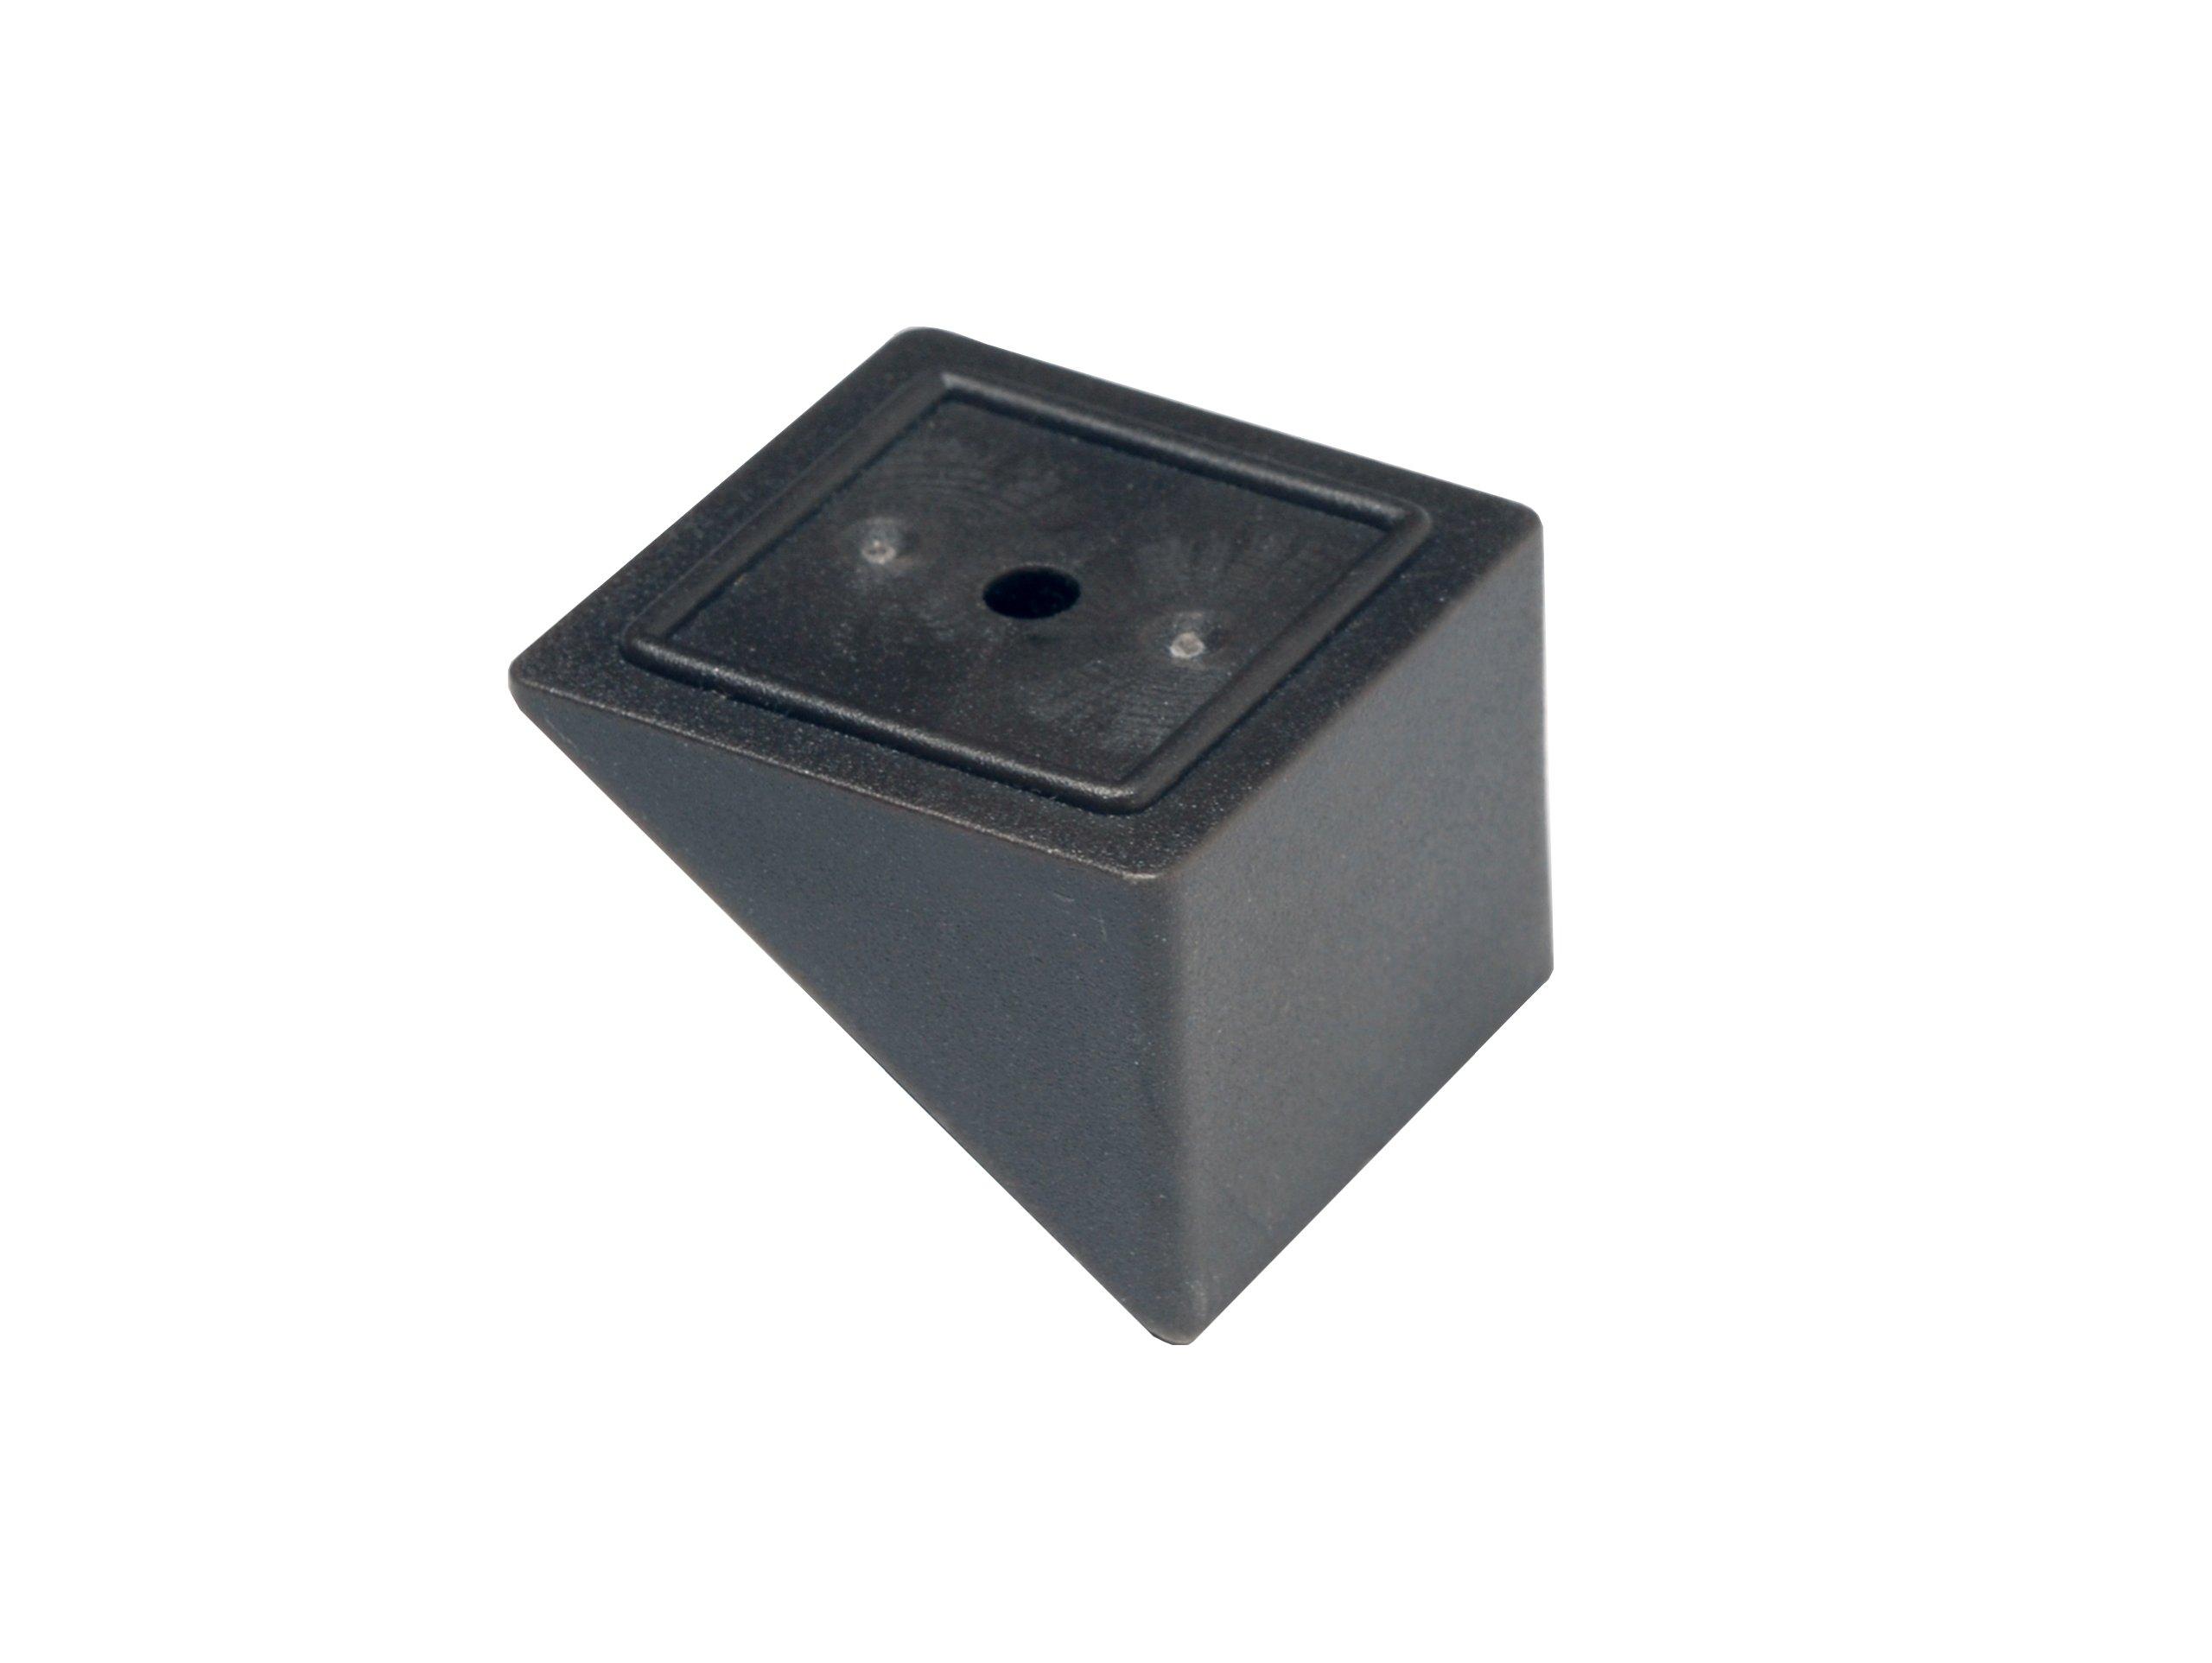 Deckorators 95881 Estate Stair Adapter, Black, 20-Pack